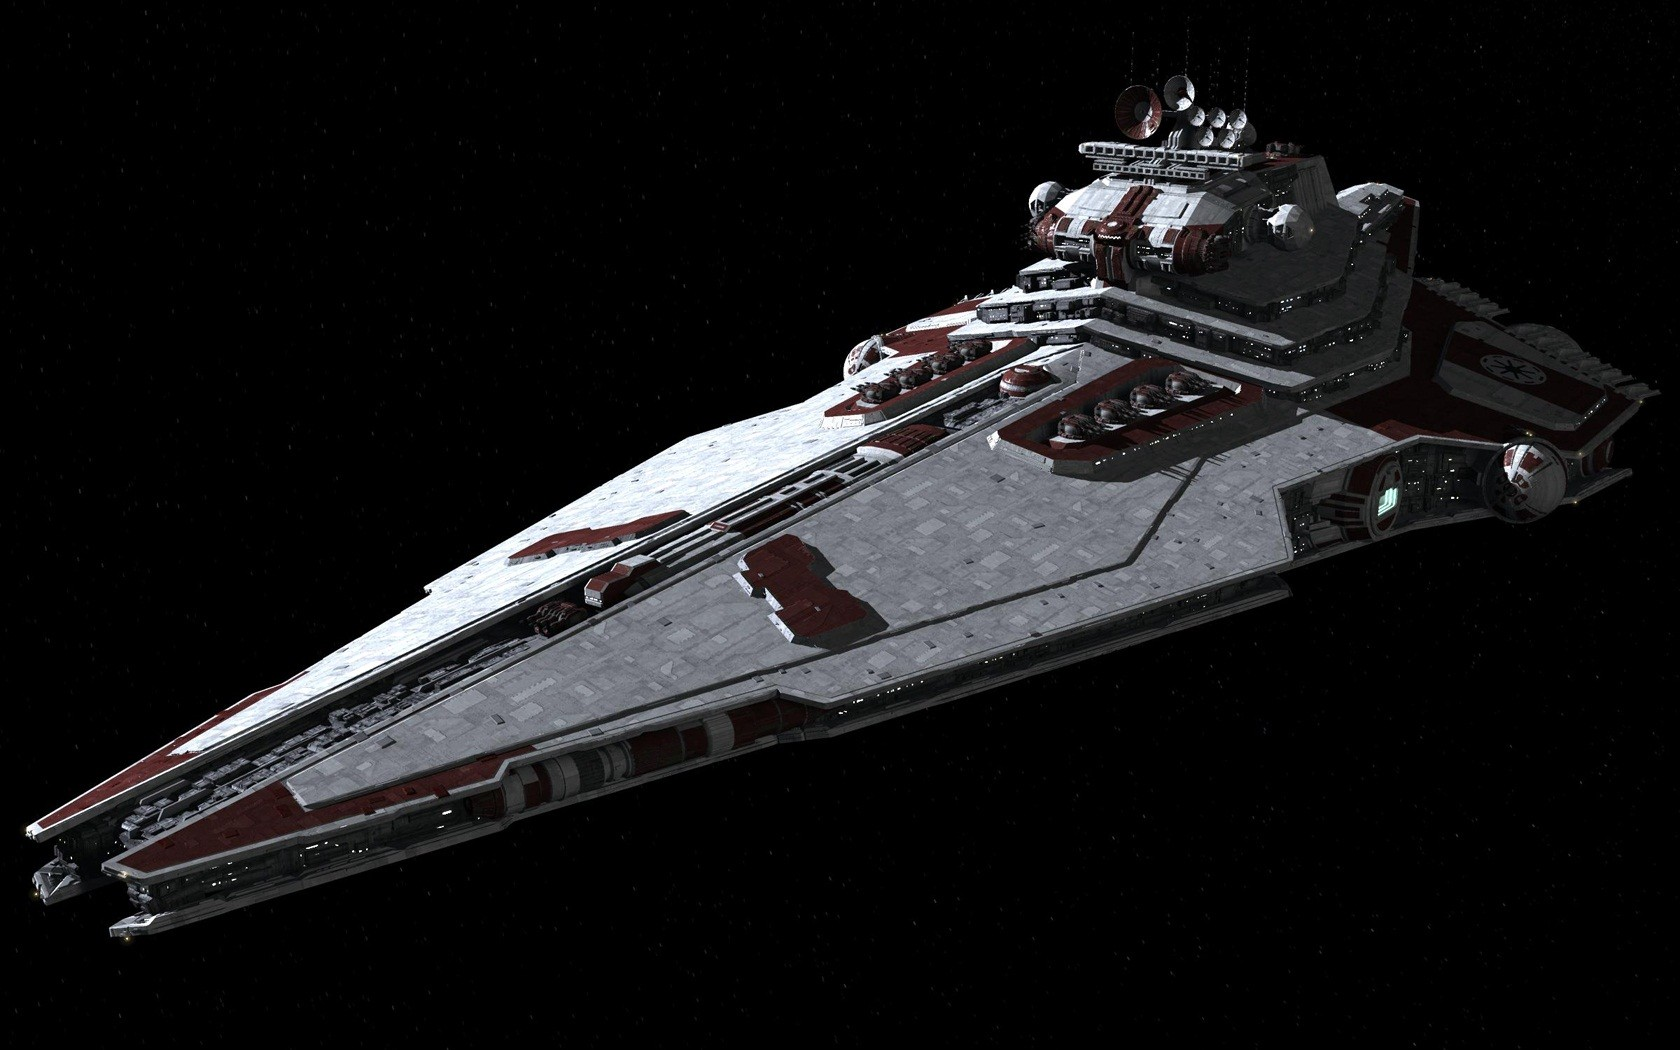 Star Wars Wallpaper 1680x1050 Star Wars Star Destroyer Legacyclass 1680x1050